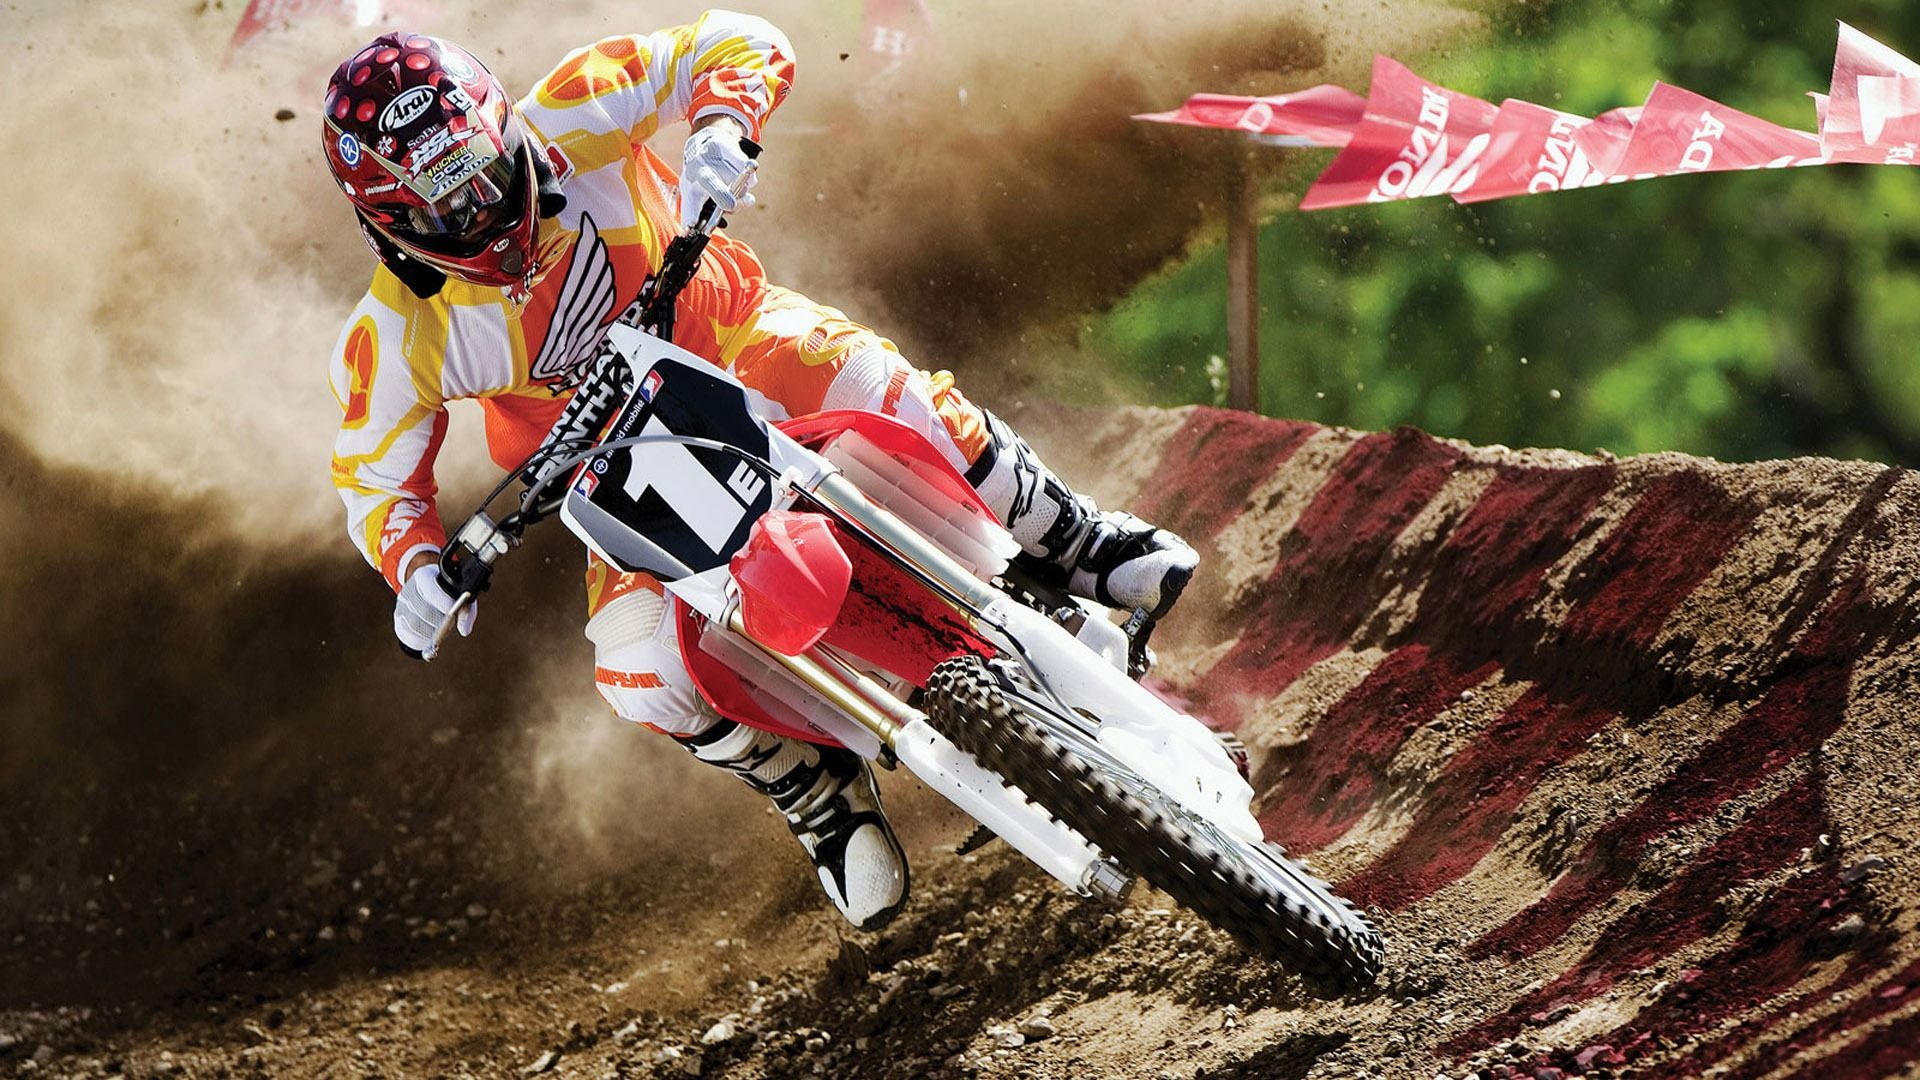 suzuki motocross bike hd - photo #45